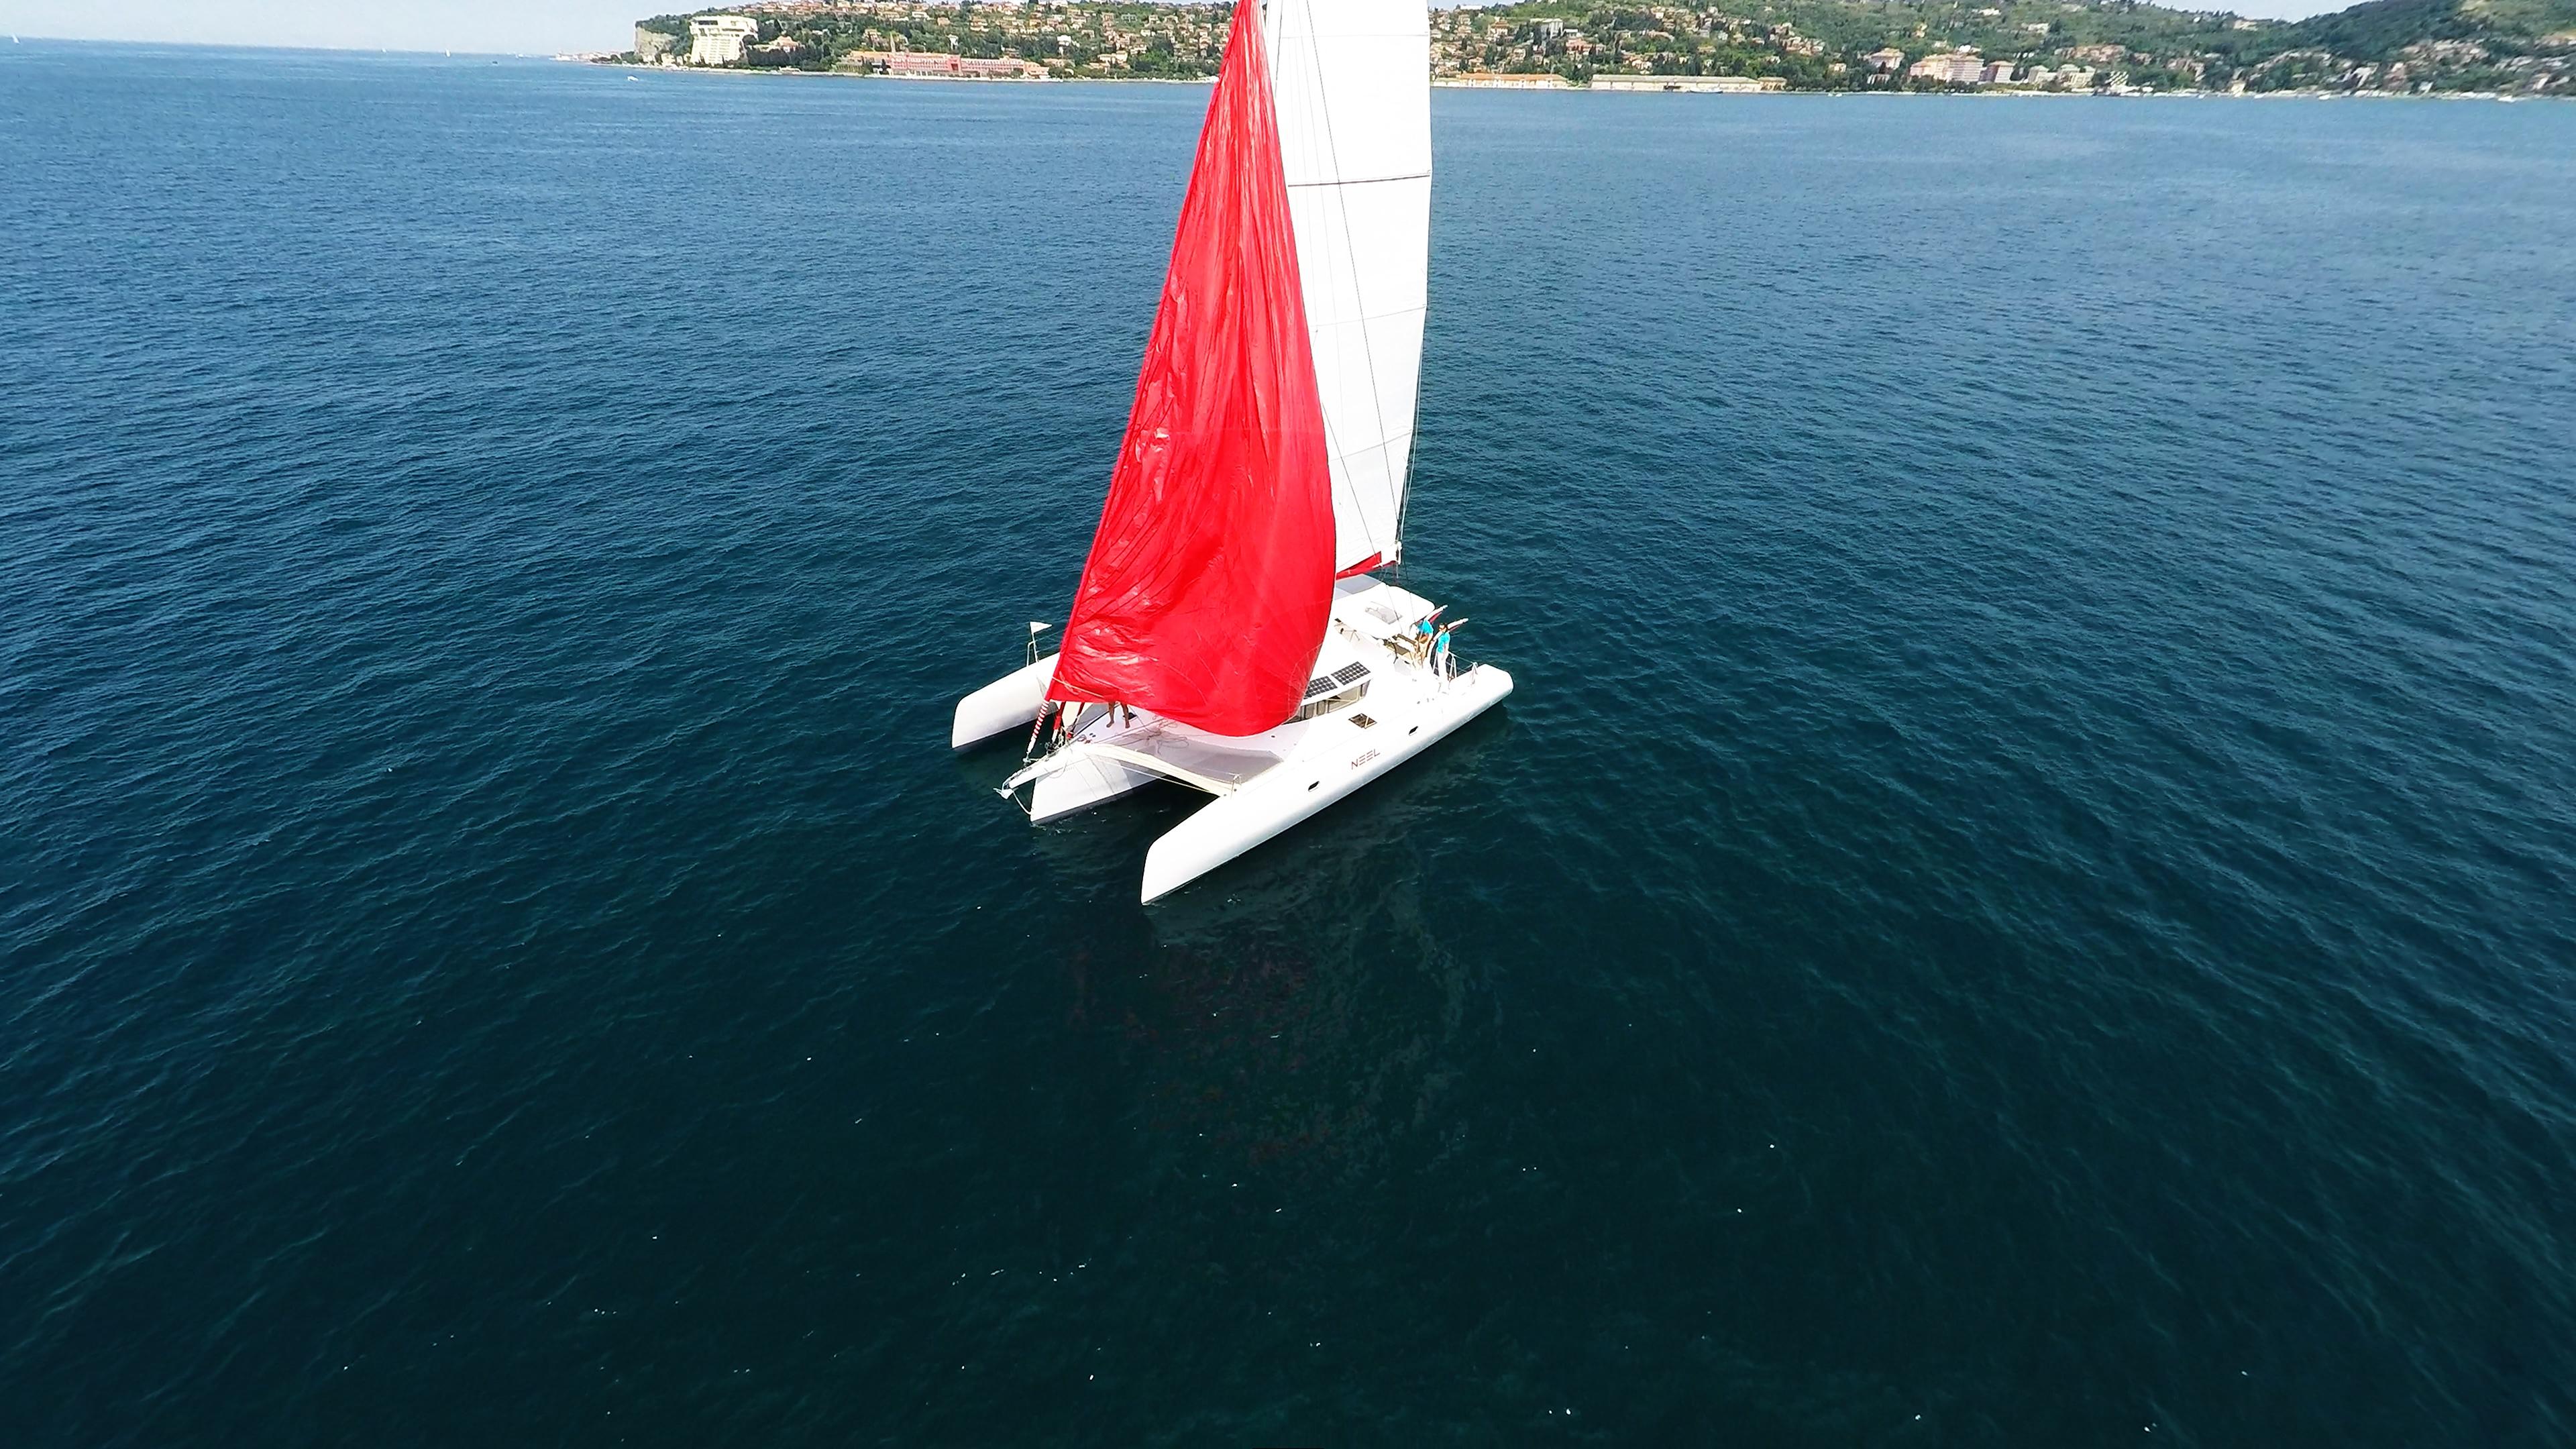 trimaran aerial photo hoisting red gennaker sail yacht